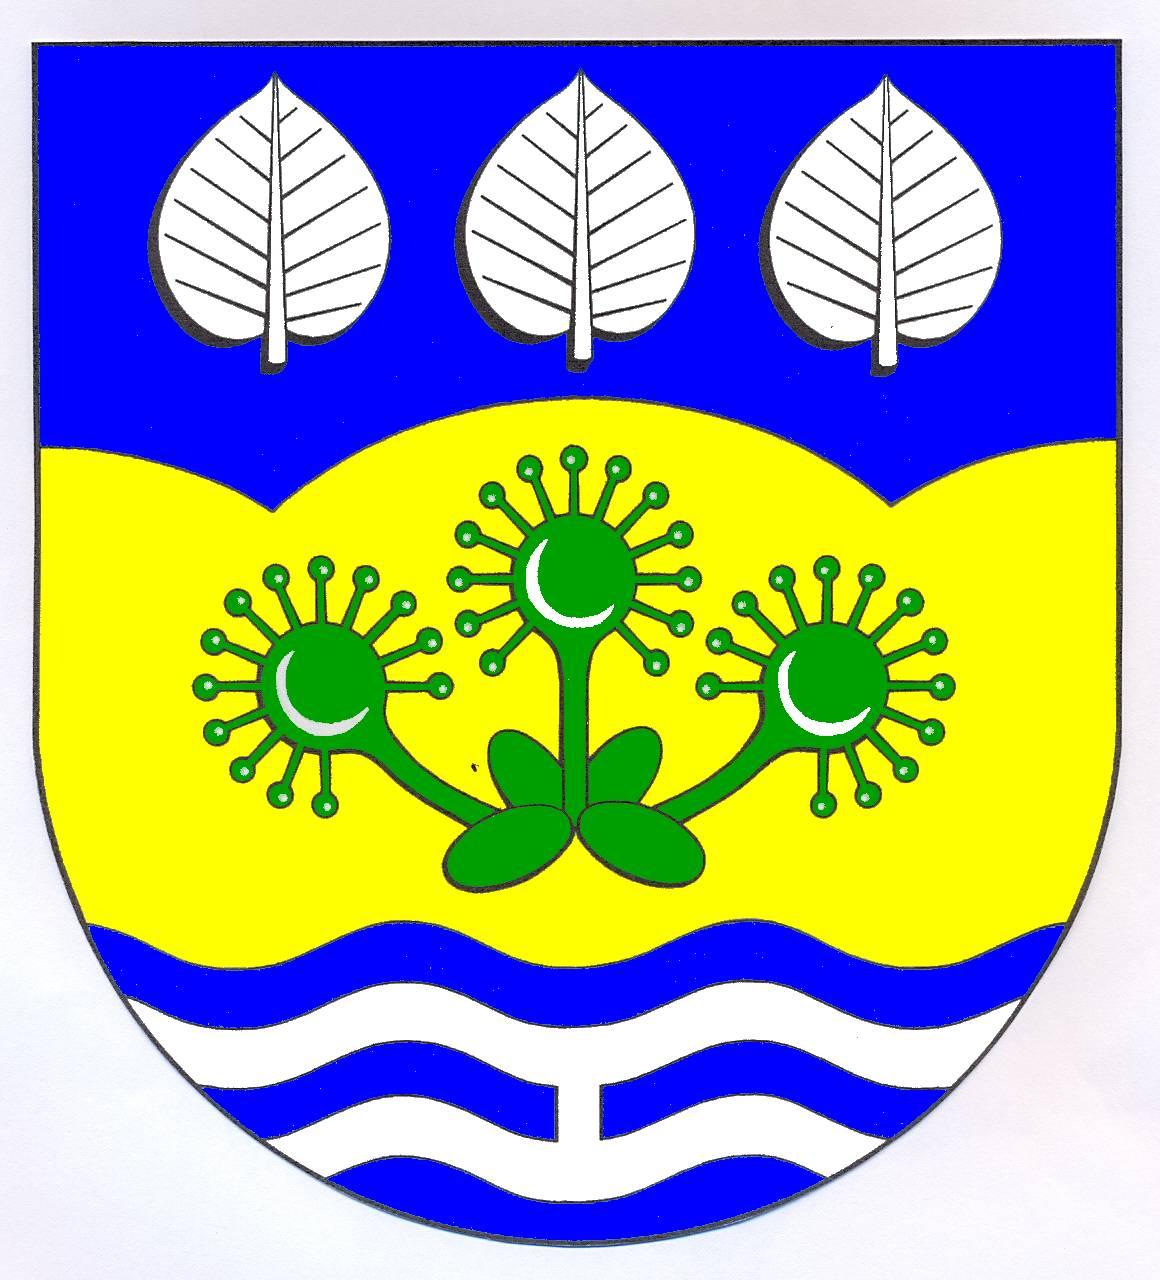 Wappen GemeindeFelm, Kreis Rendsburg-Eckernförde